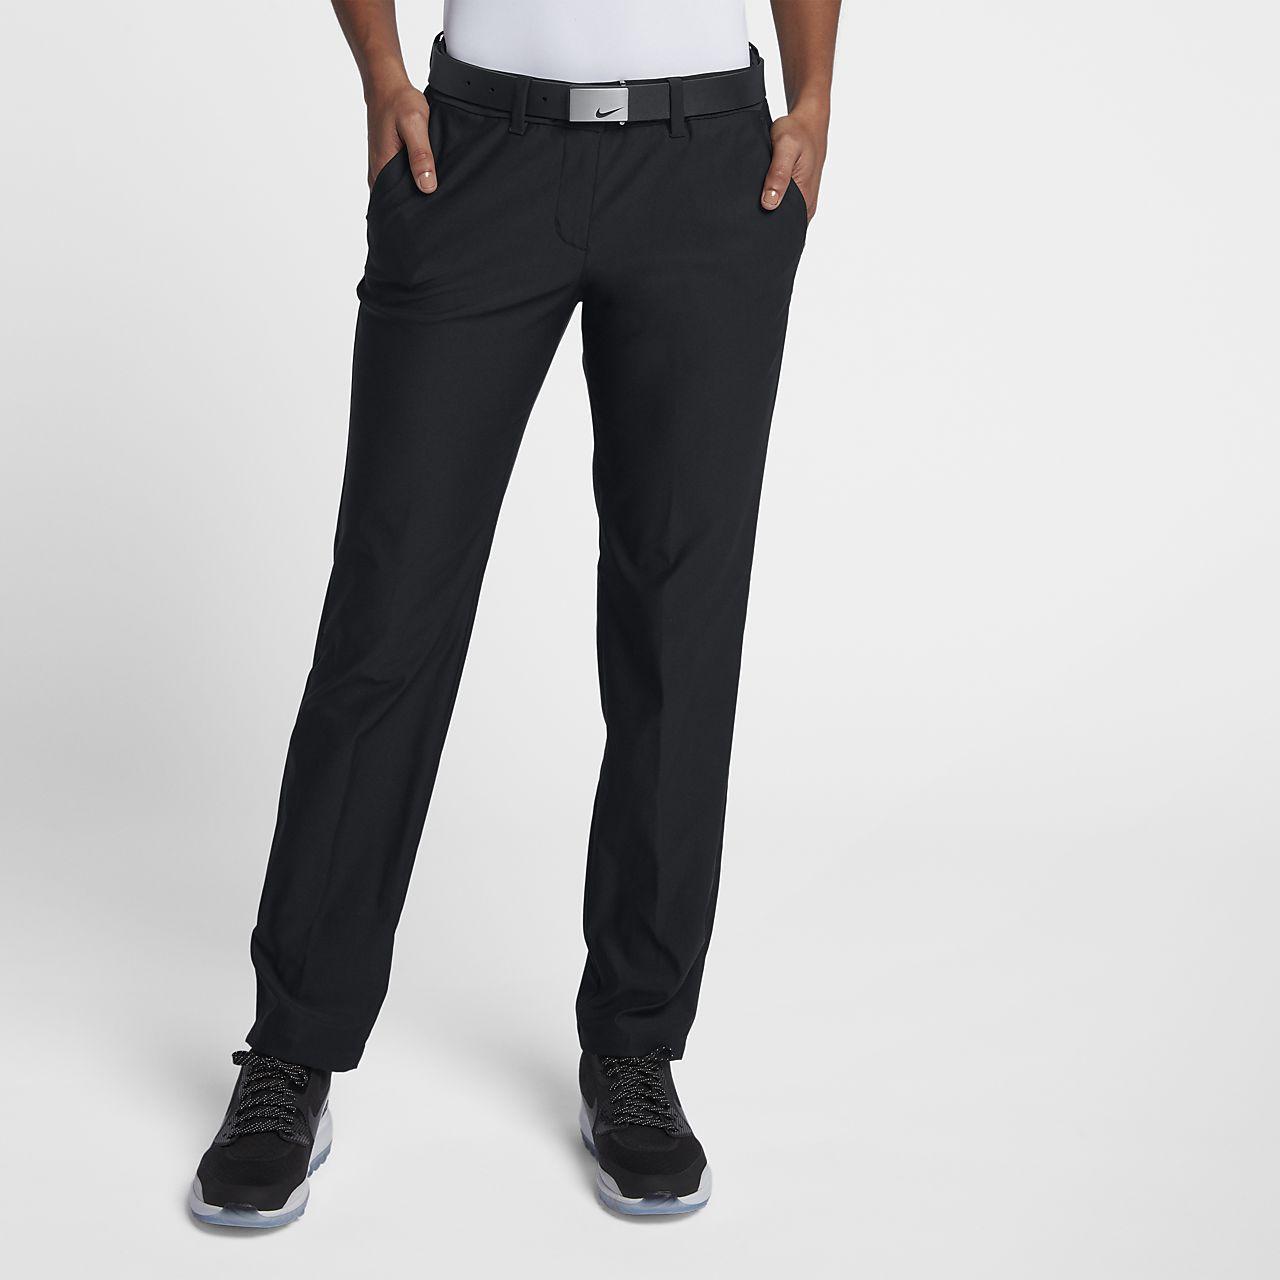 Pantalones de golf para mujer Nike Flex